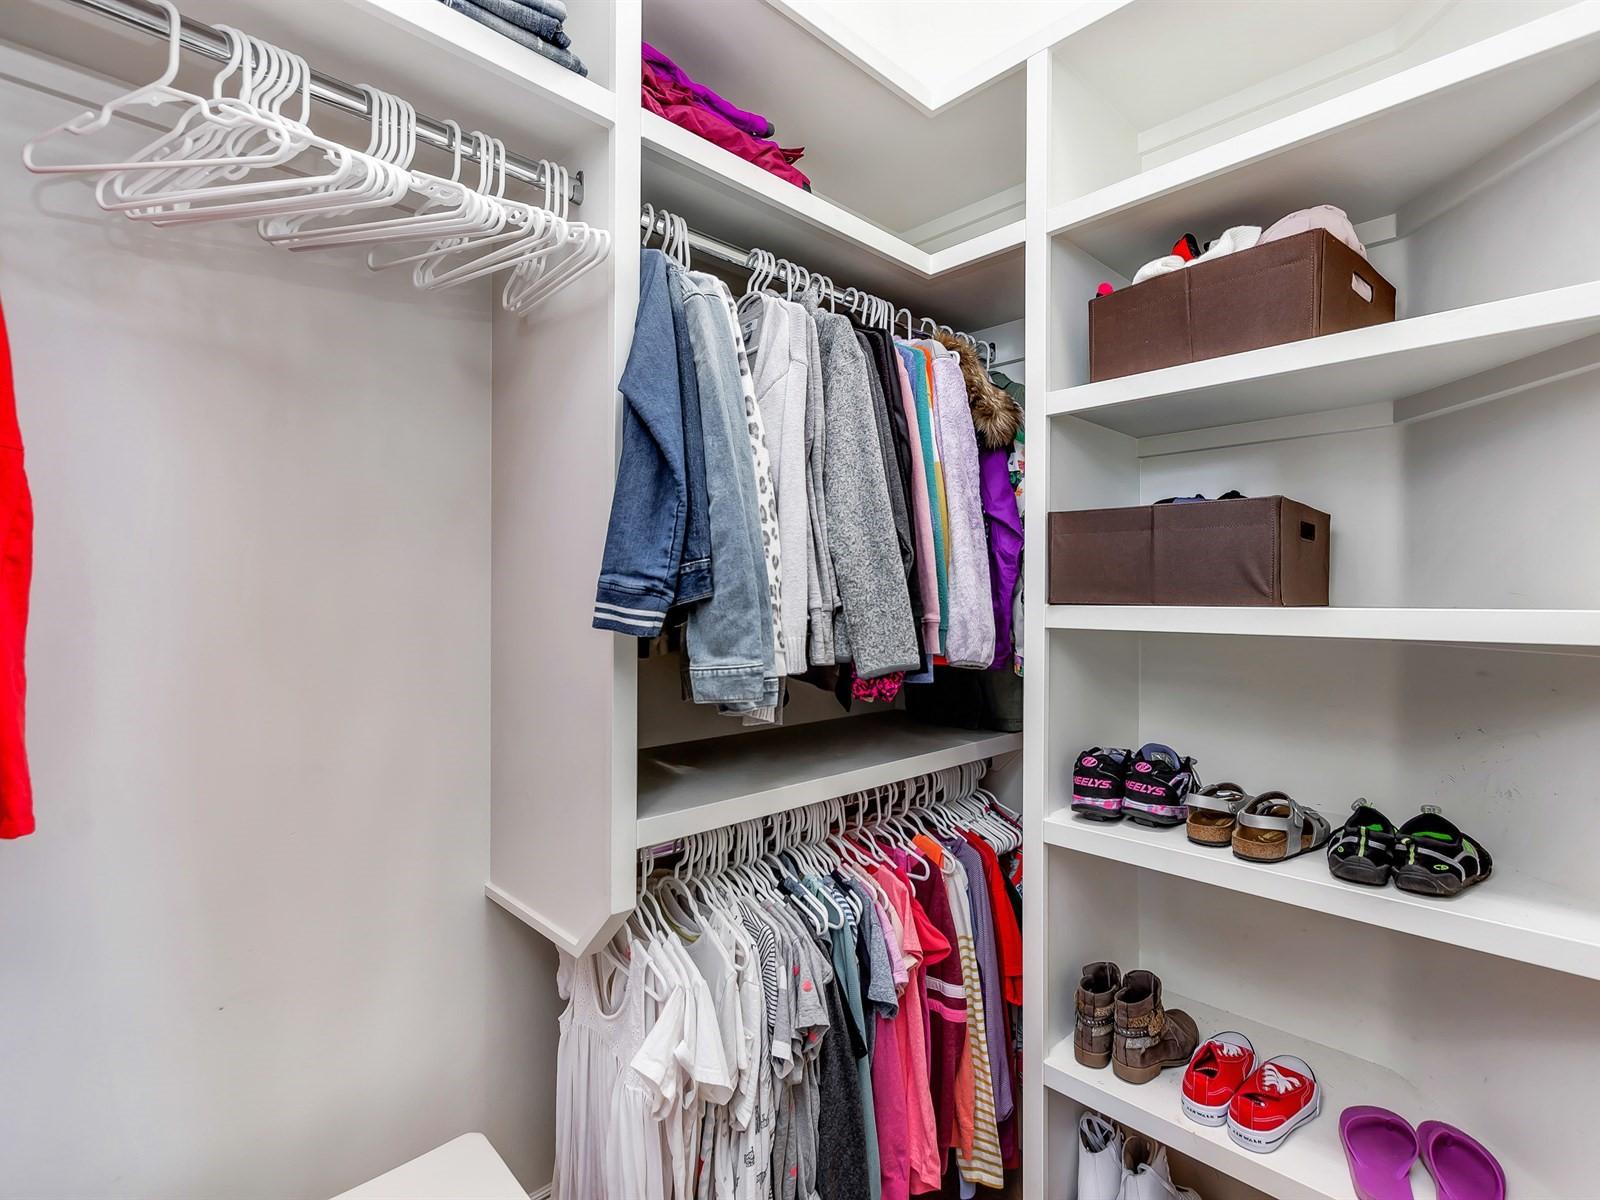 027_Bedroom Closet.jpg